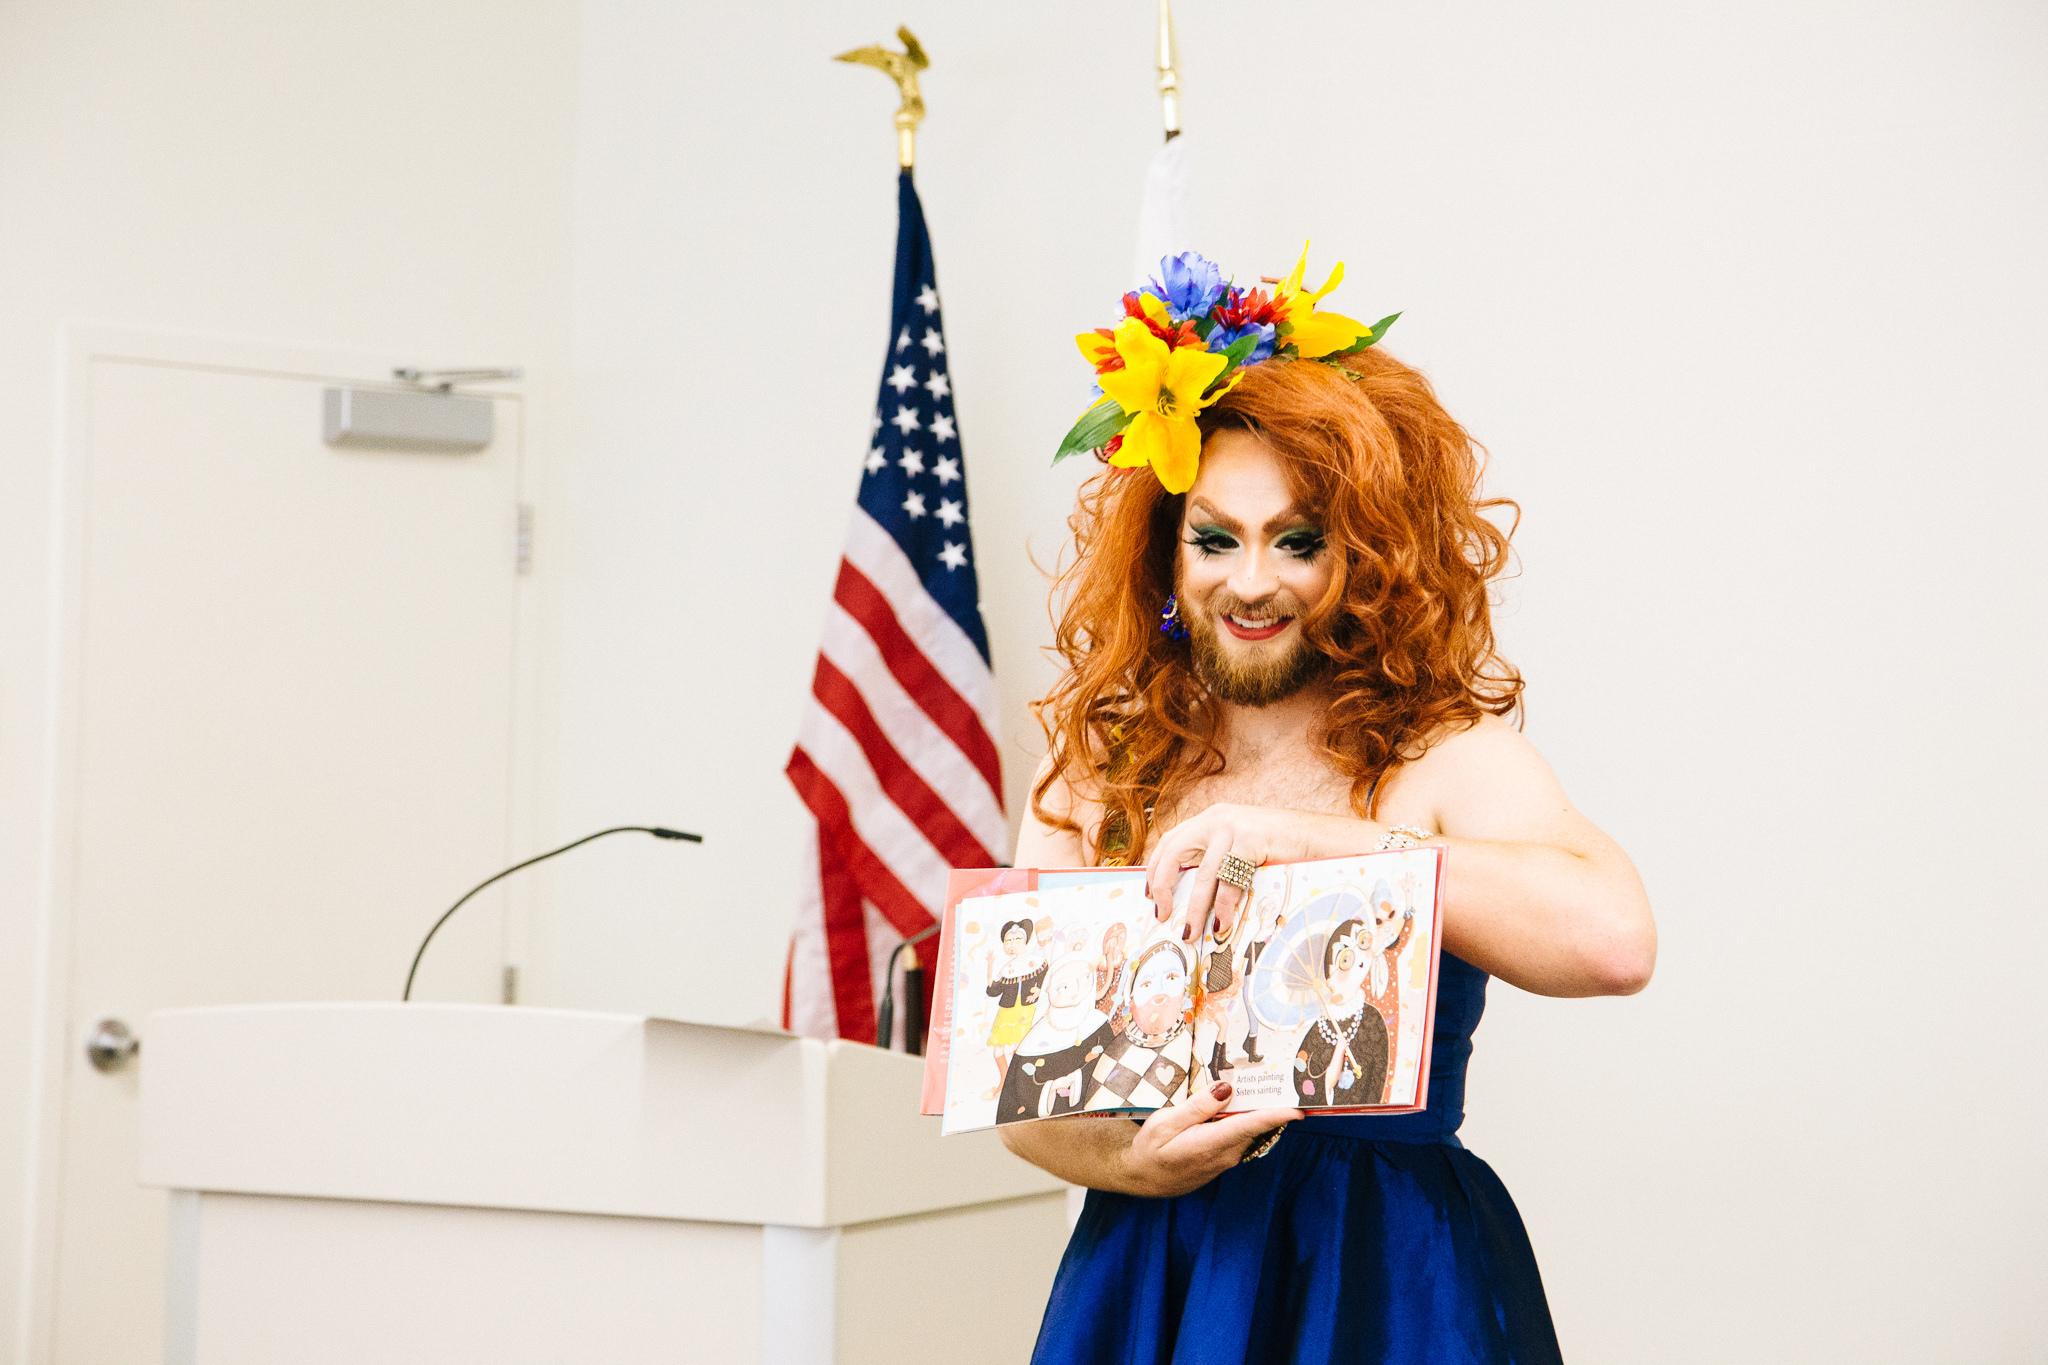 6-22-19 - Drag Queen Story Hour - Drag Queen Story Hour at One City One Pride, photo credit Tony Coelho.jpg